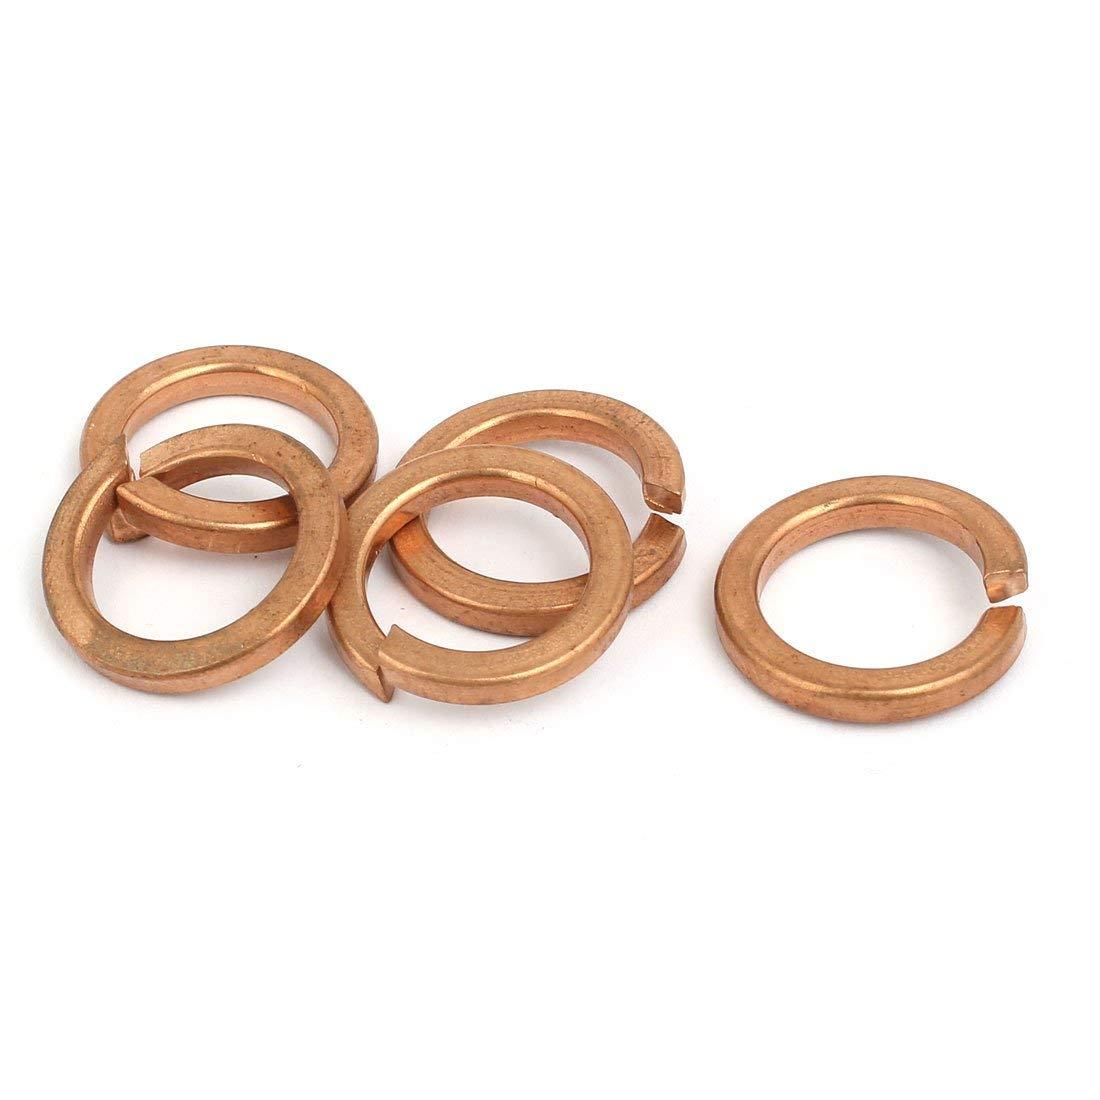 uxcell 16mm Inner Diameter Split Lock Spring Washer Gasket Copper Tone 5pcs